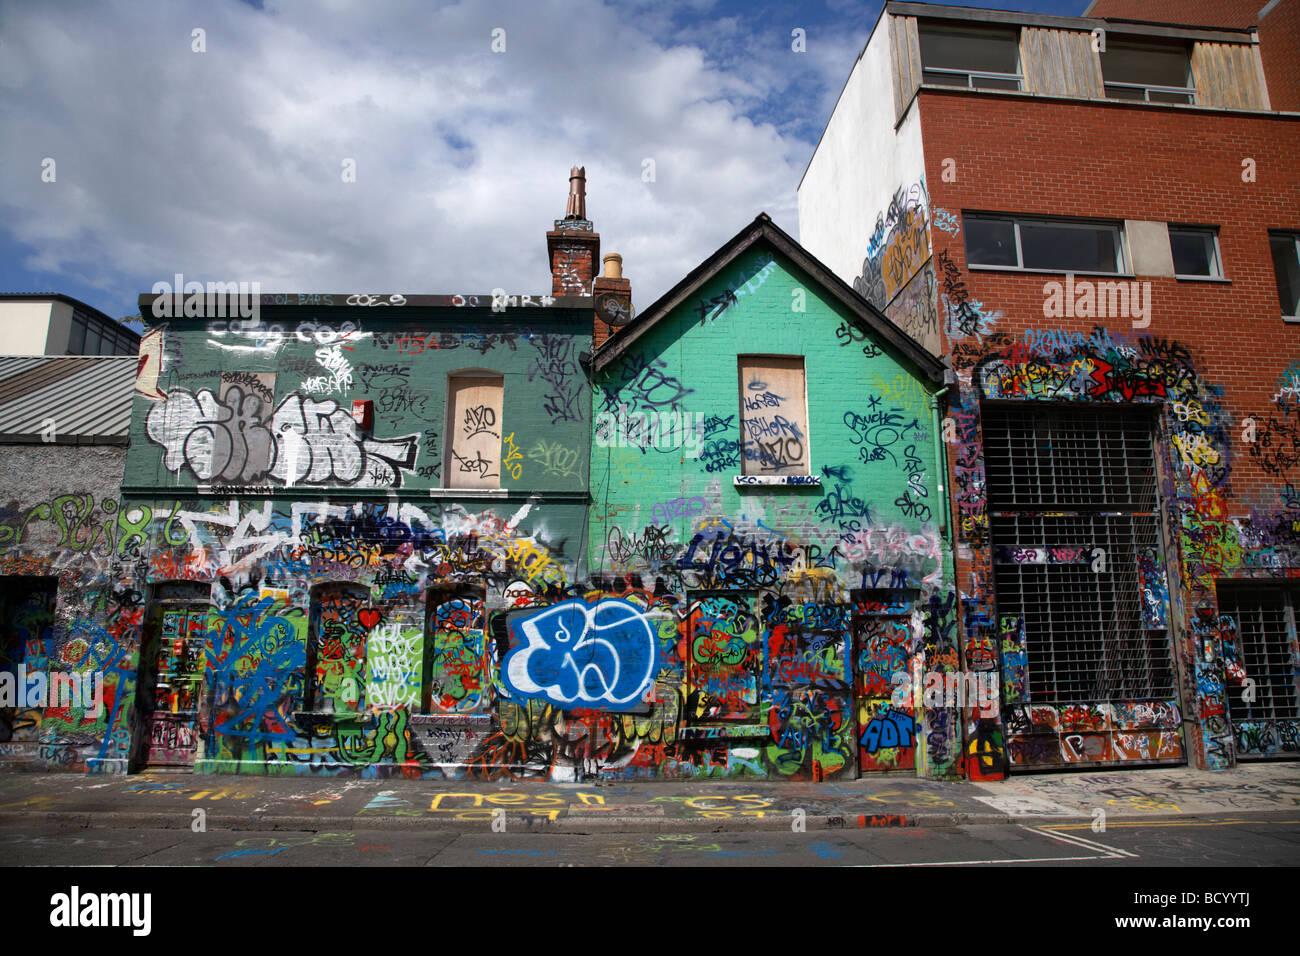 the famous U2 wall covered in fan grafitti at windmill lane studios in dublin republic of ireland - Stock Image